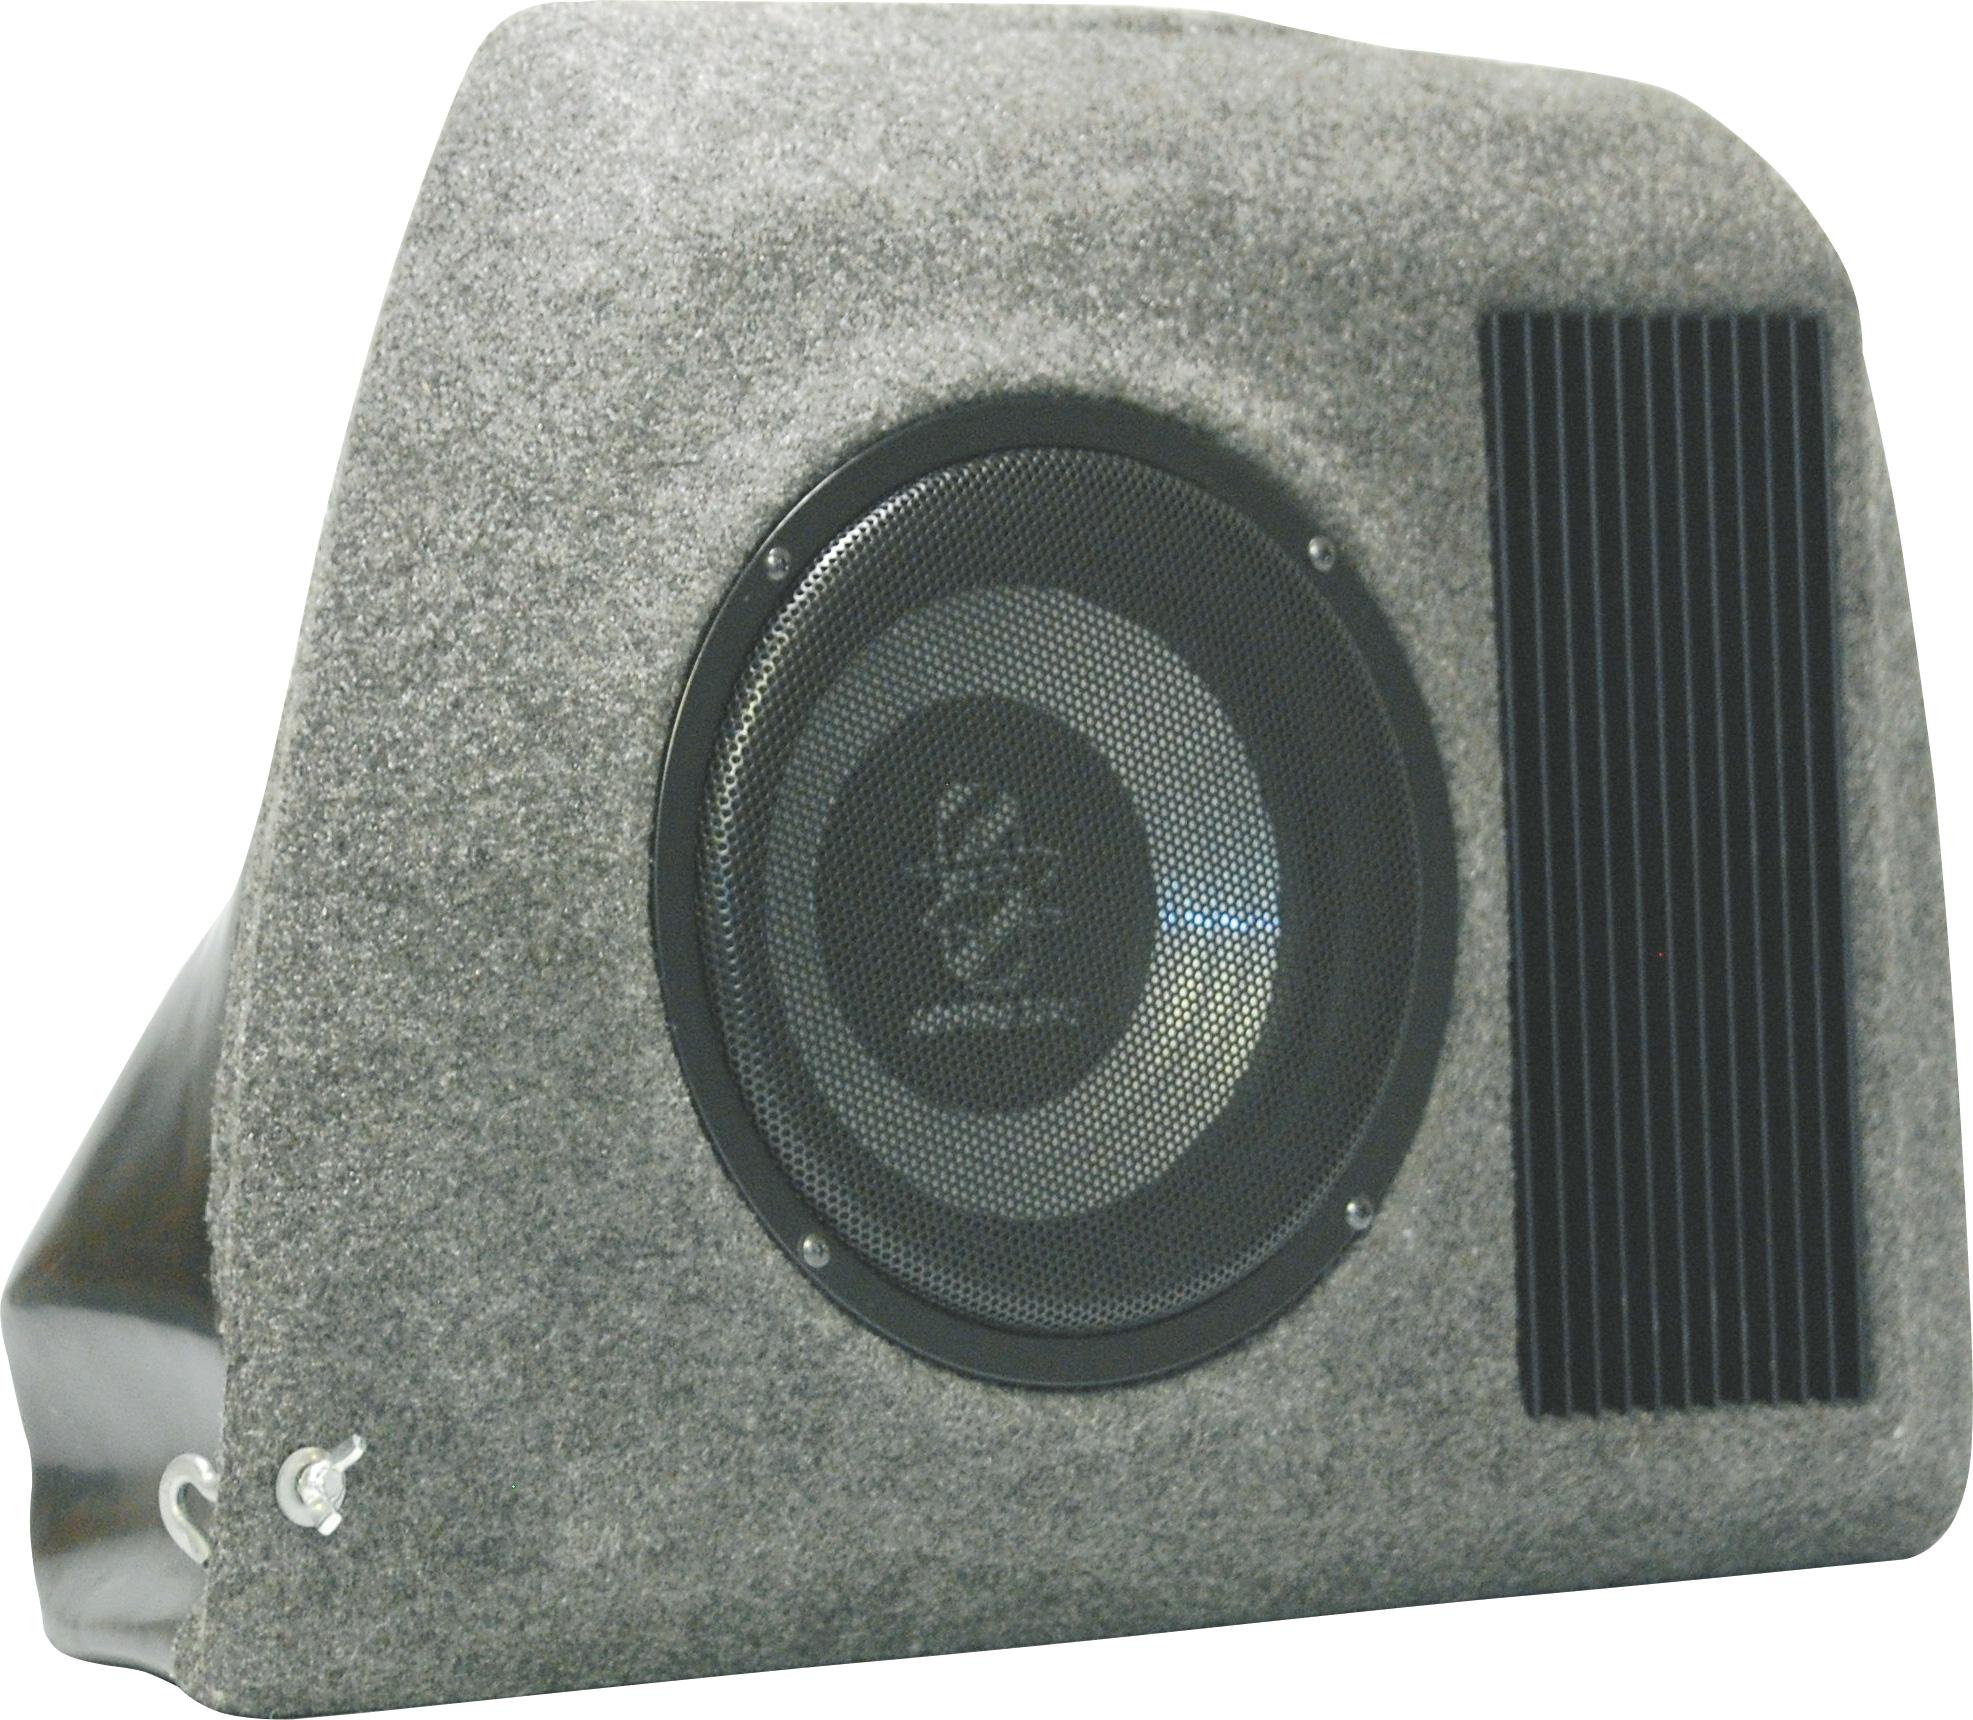 hama news zur automechanika 2012 deine. Black Bedroom Furniture Sets. Home Design Ideas